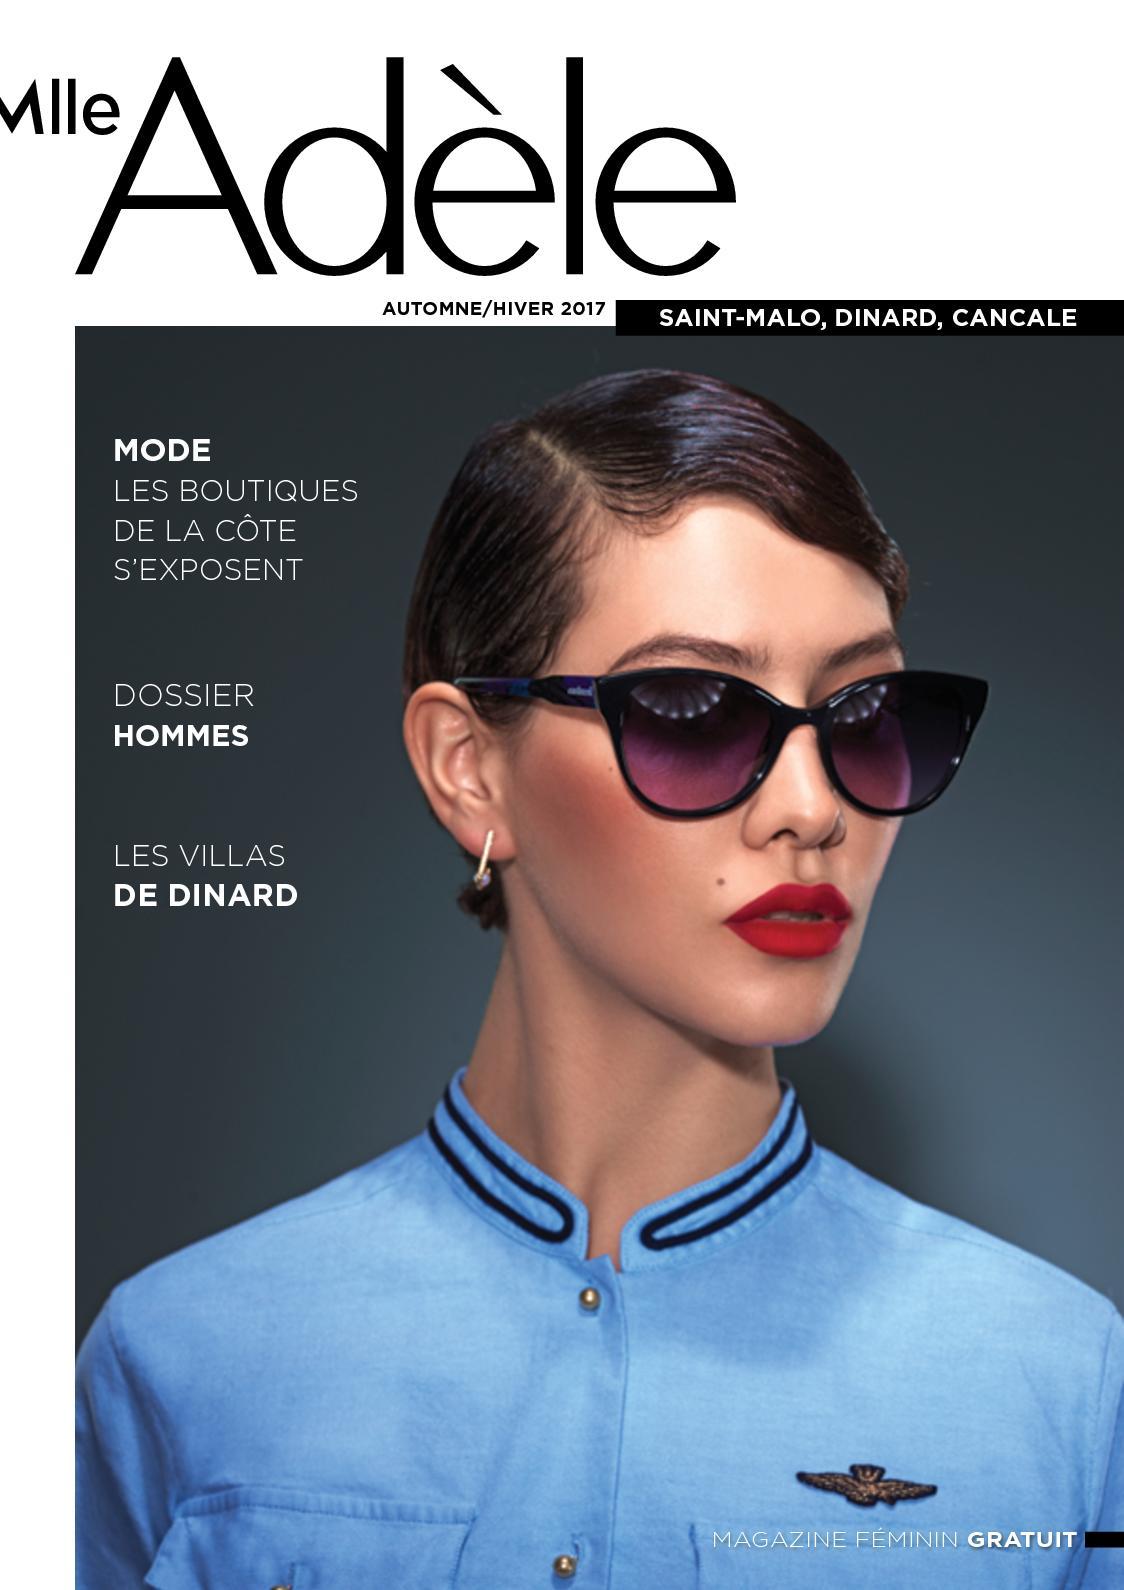 Calaméo - Magazine Mlle Adèle Côte D emeraude N°8 75e0b454e4c